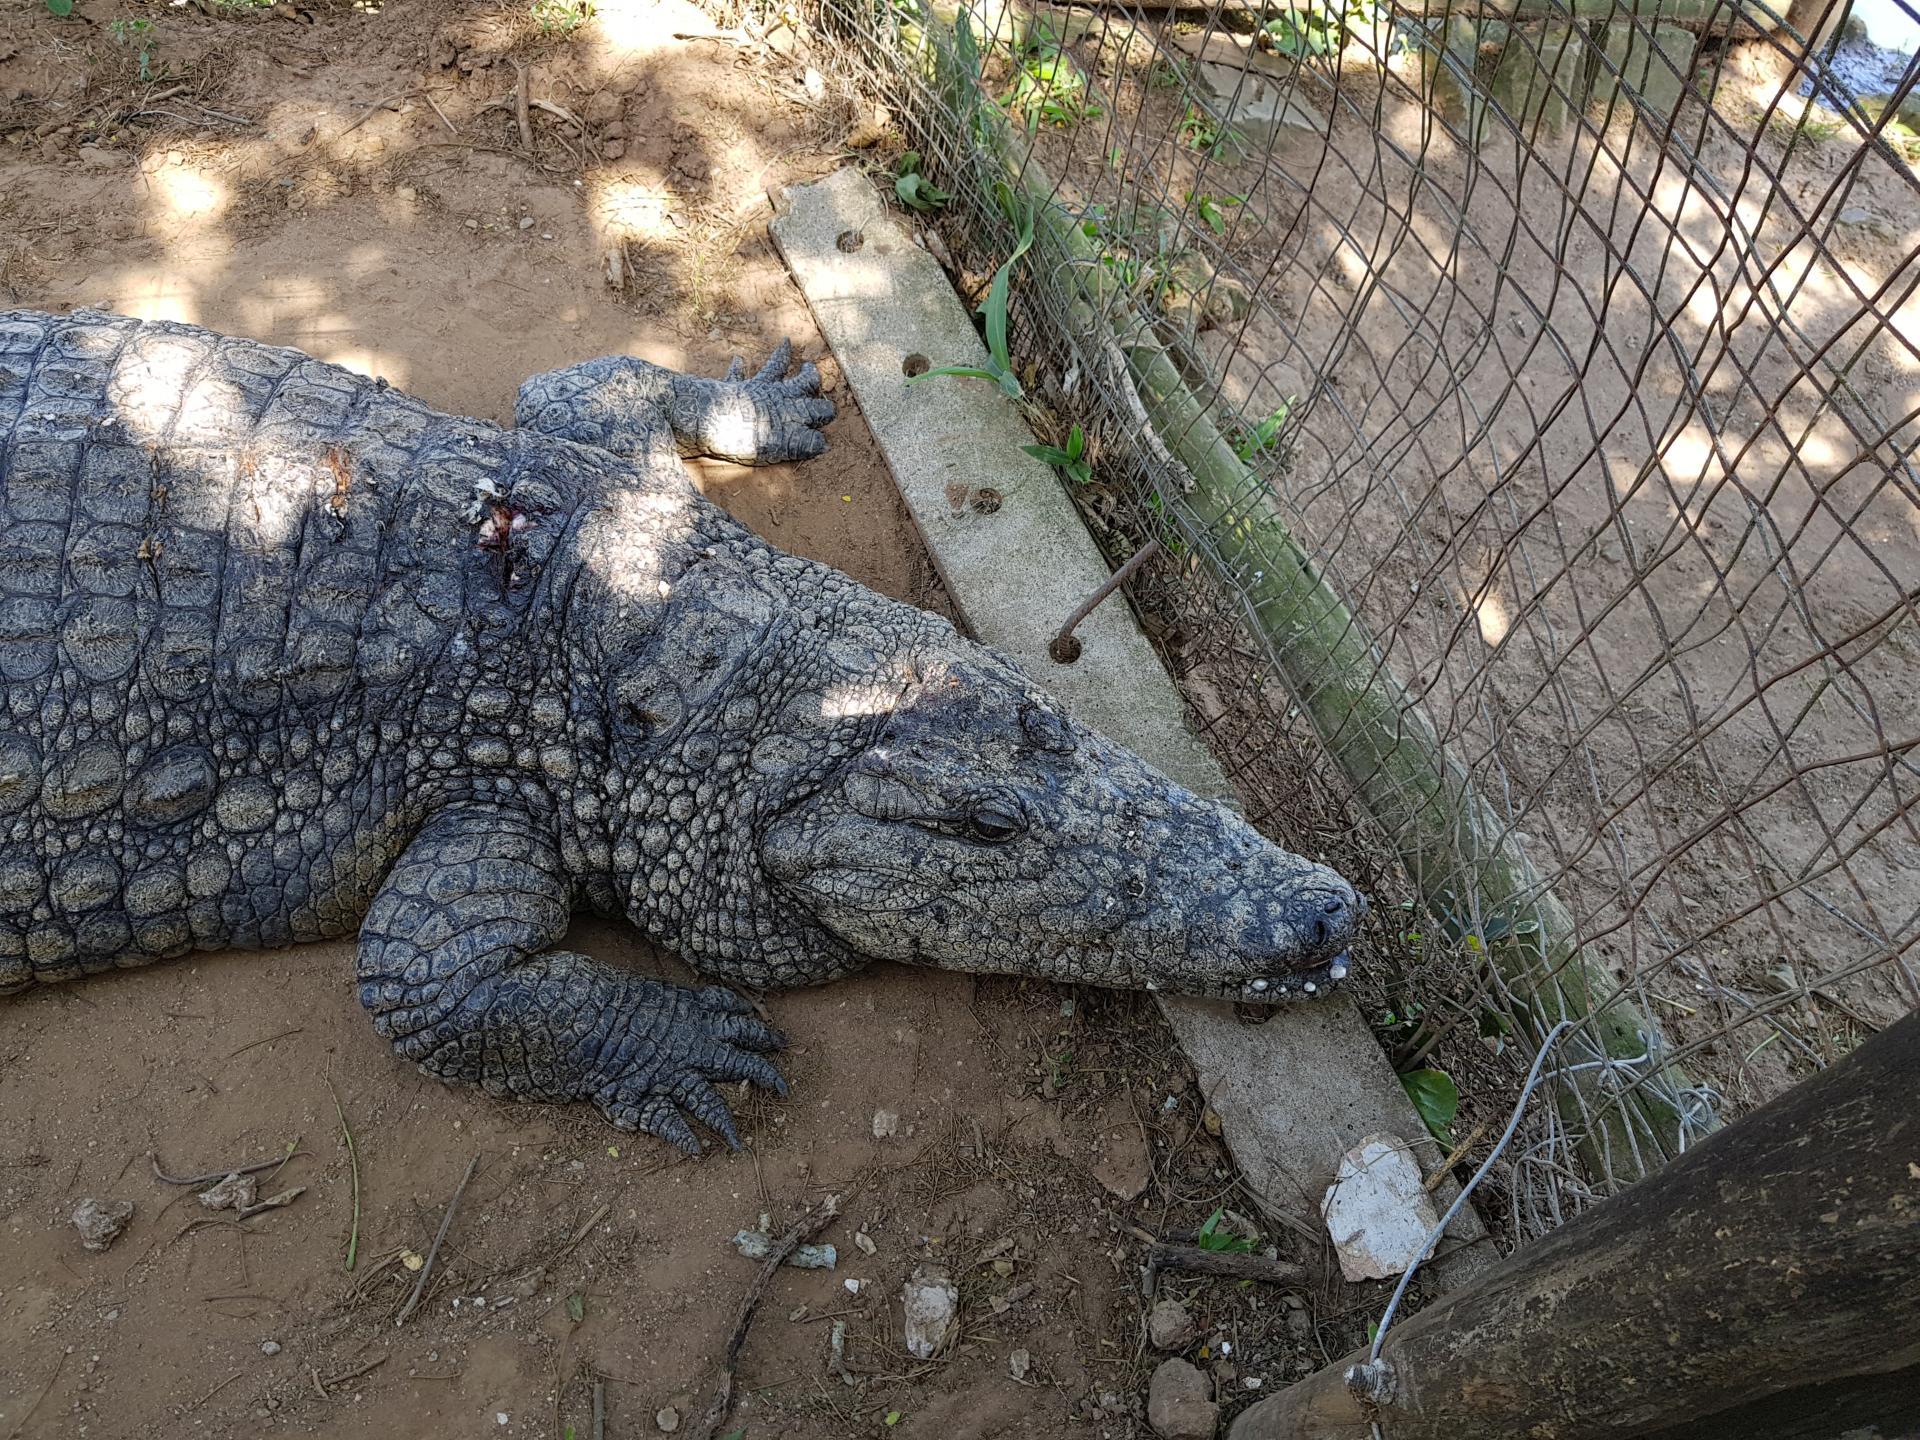 старый крокодил